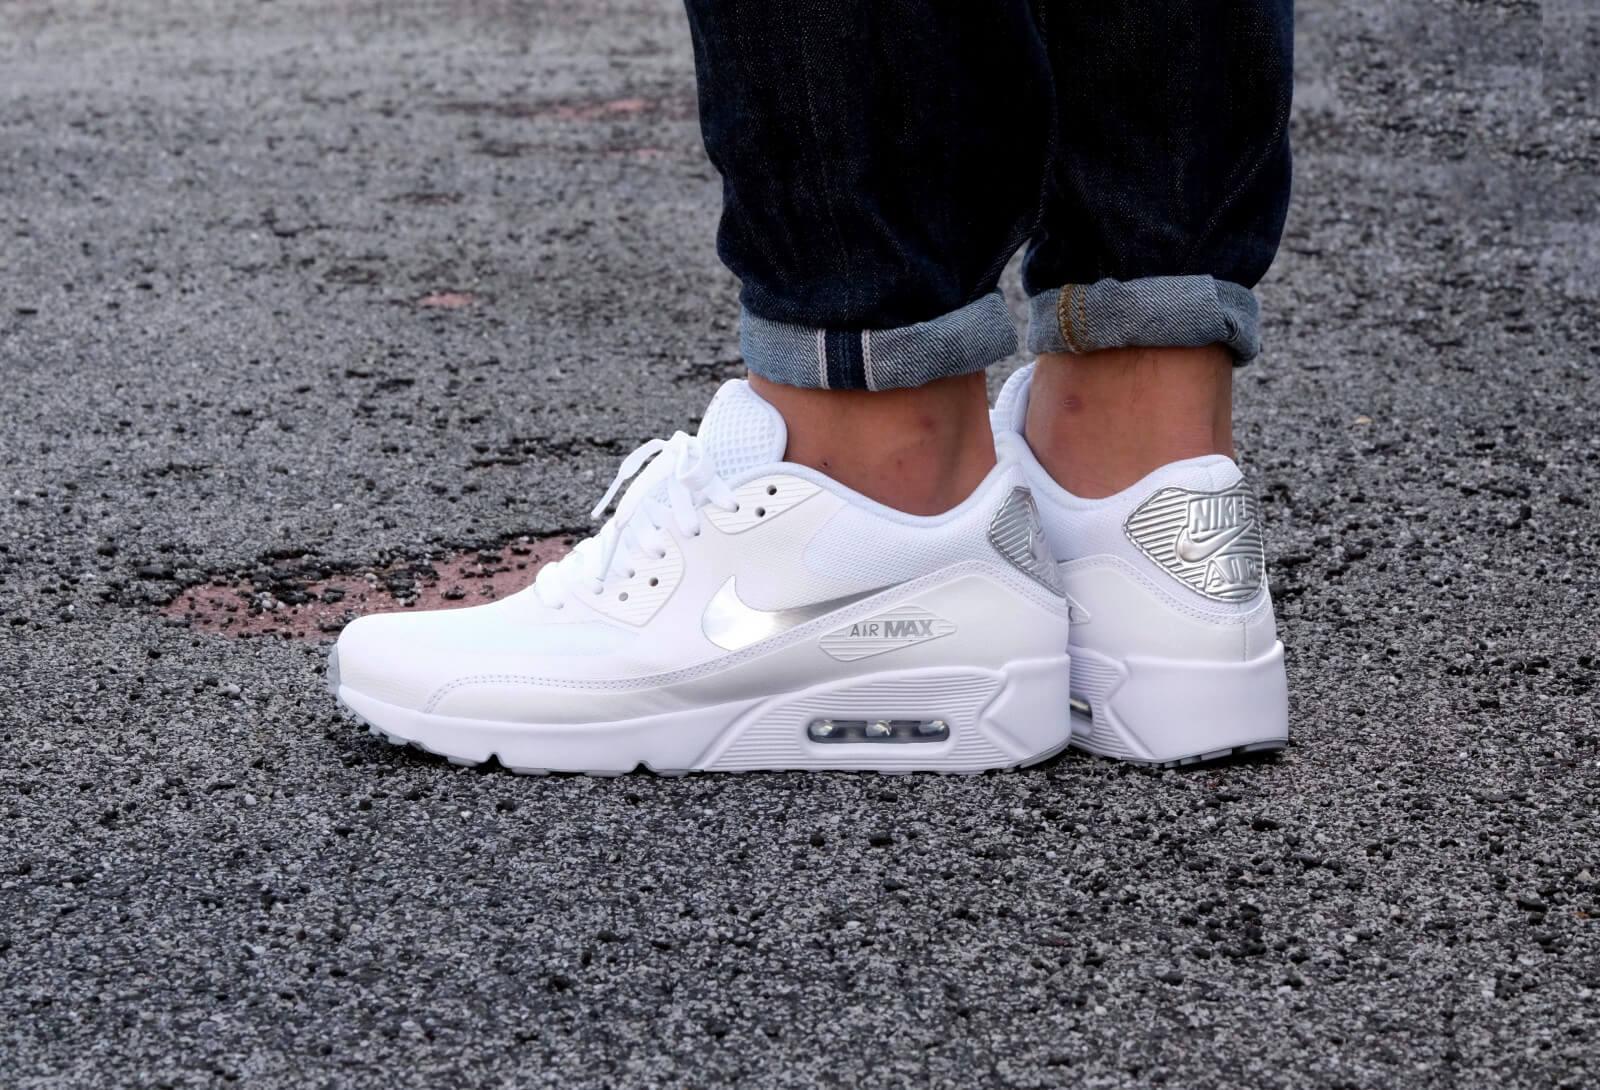 Nike Air Max 90 Ultra 2.0 Essential WhiteMetallic Silver White 875695 103